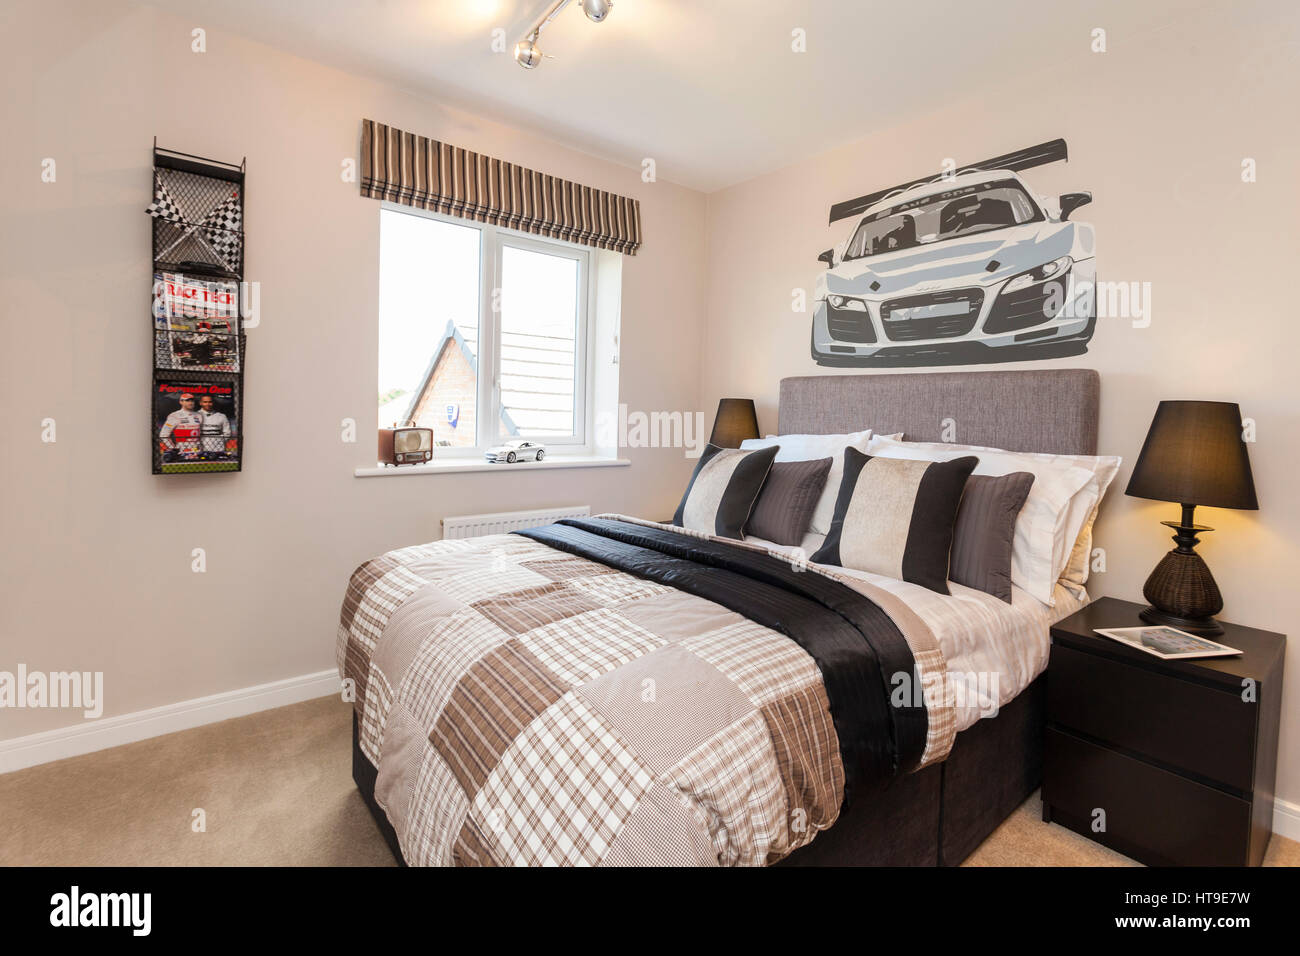 Home Interieur, jungen Schlafzimmer, racing Auto Theme, Formel 14 ...